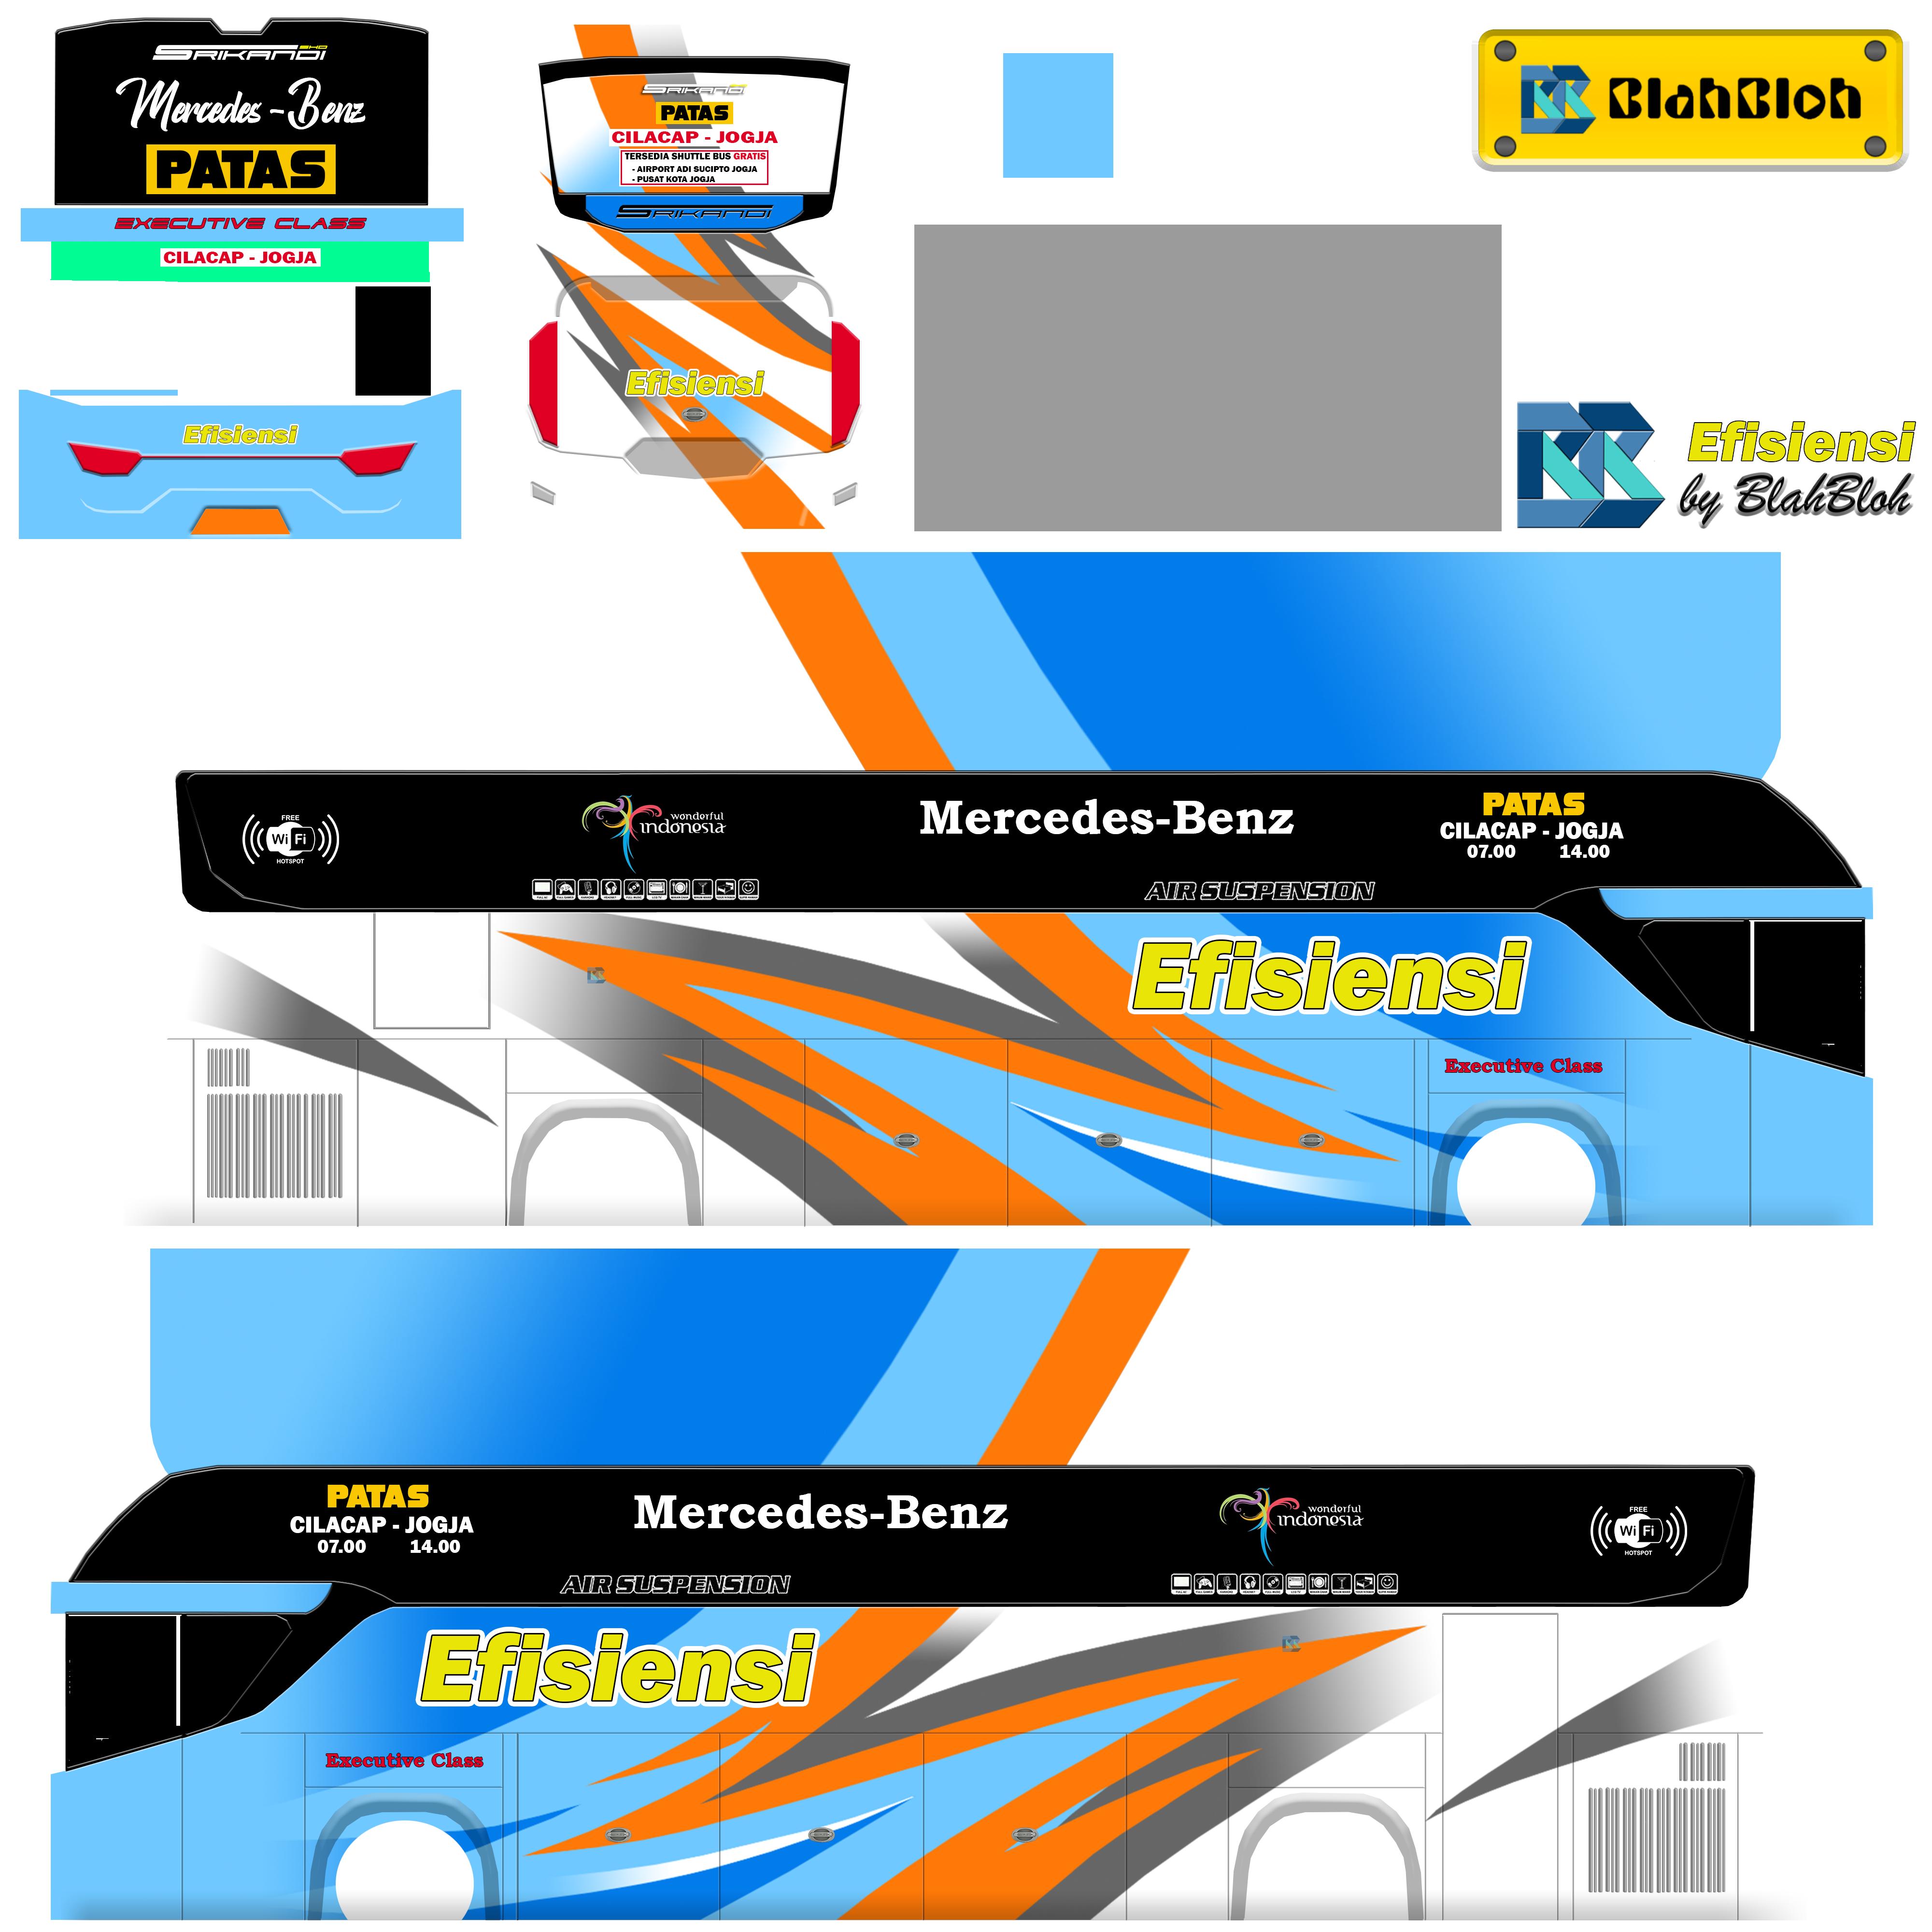 Kumpulan Livery Srikandi Shd Bussid Terbaru Kualitas Jernih Png Konsep Mobil Stiker Mobil Mobil Modifikasi